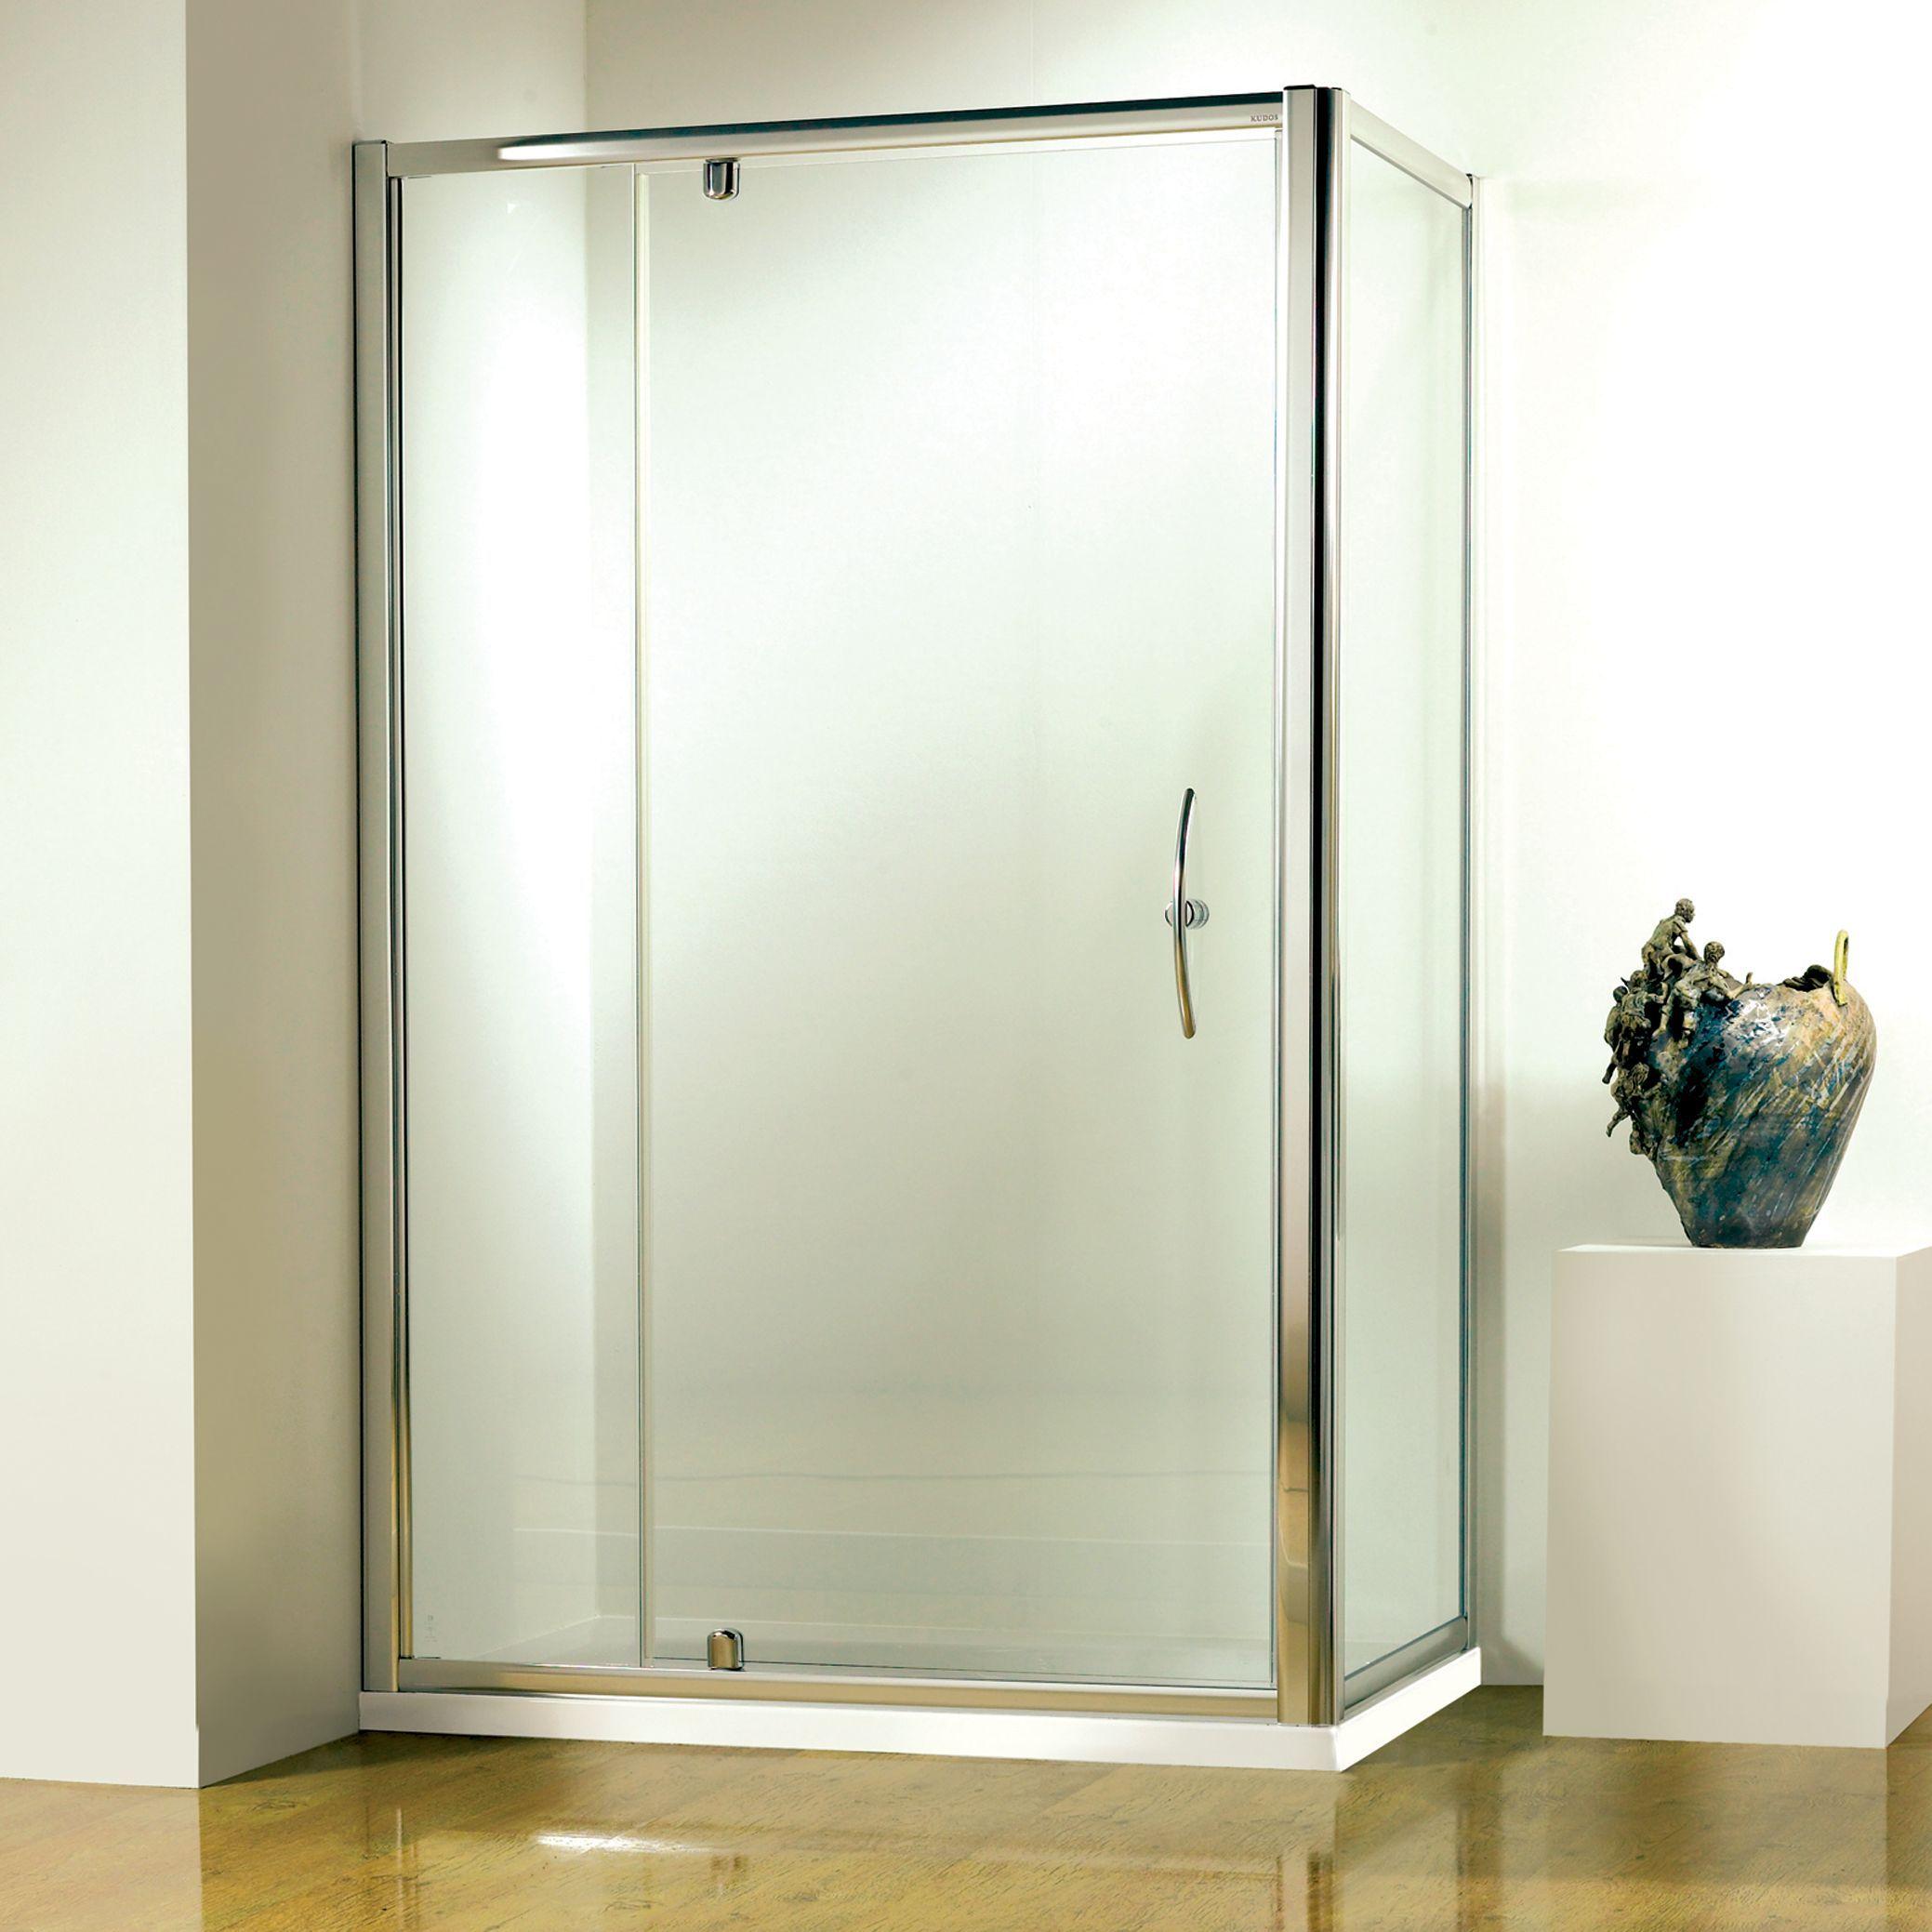 John Lewis & Partners 120 x 80cm Shower Enclosure with